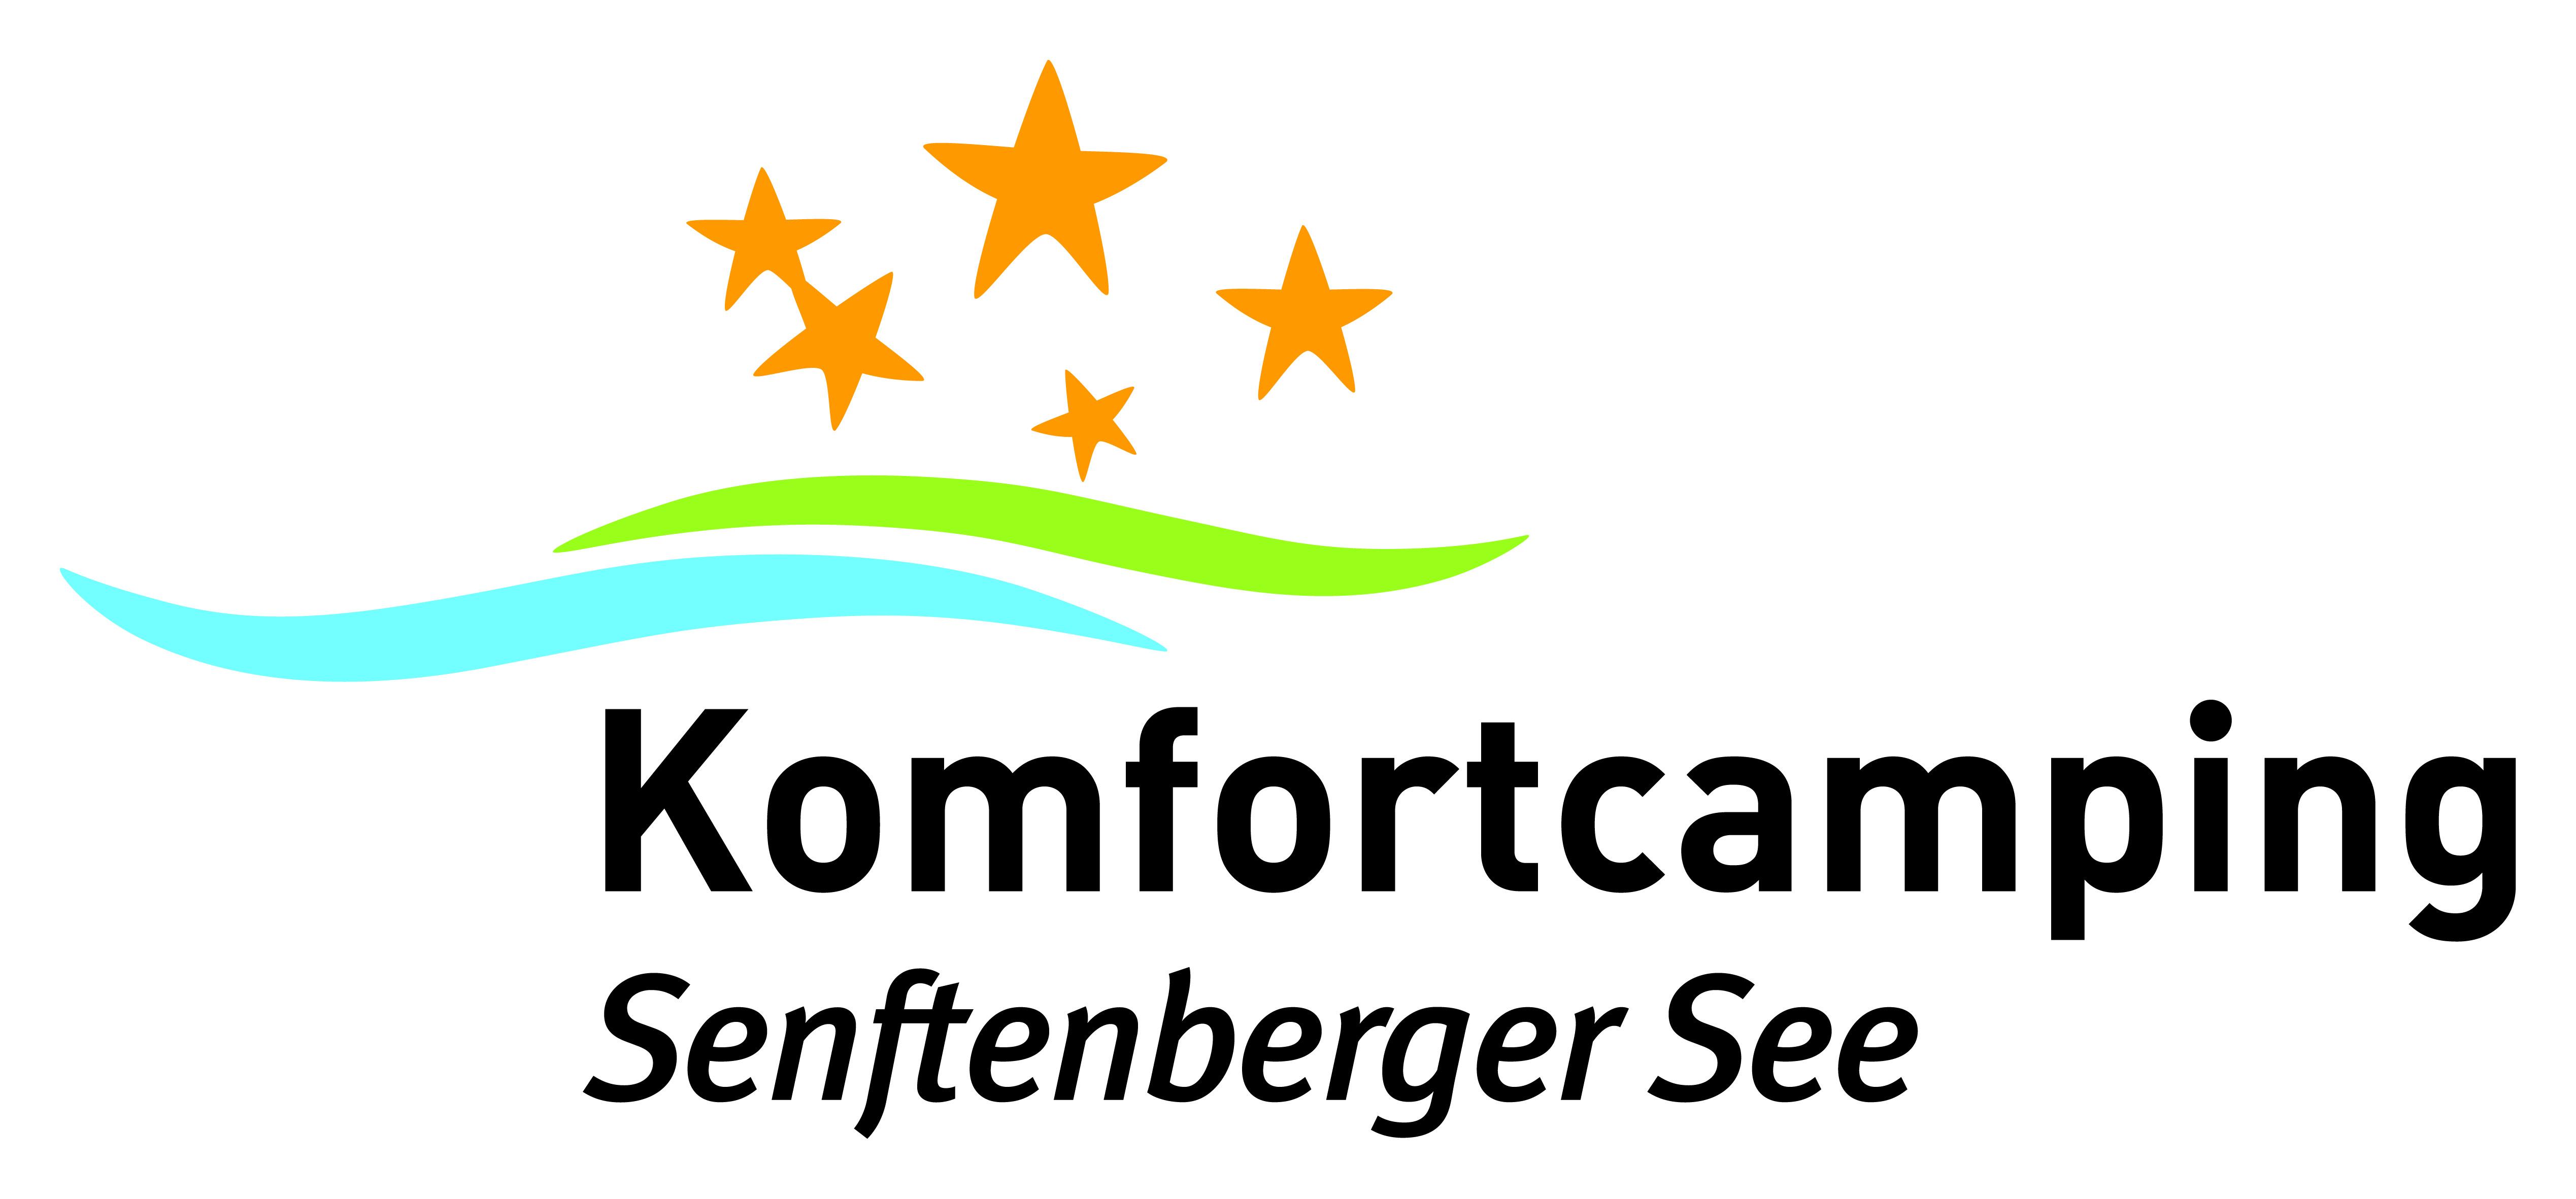 Komfortcamping Senftenberger See